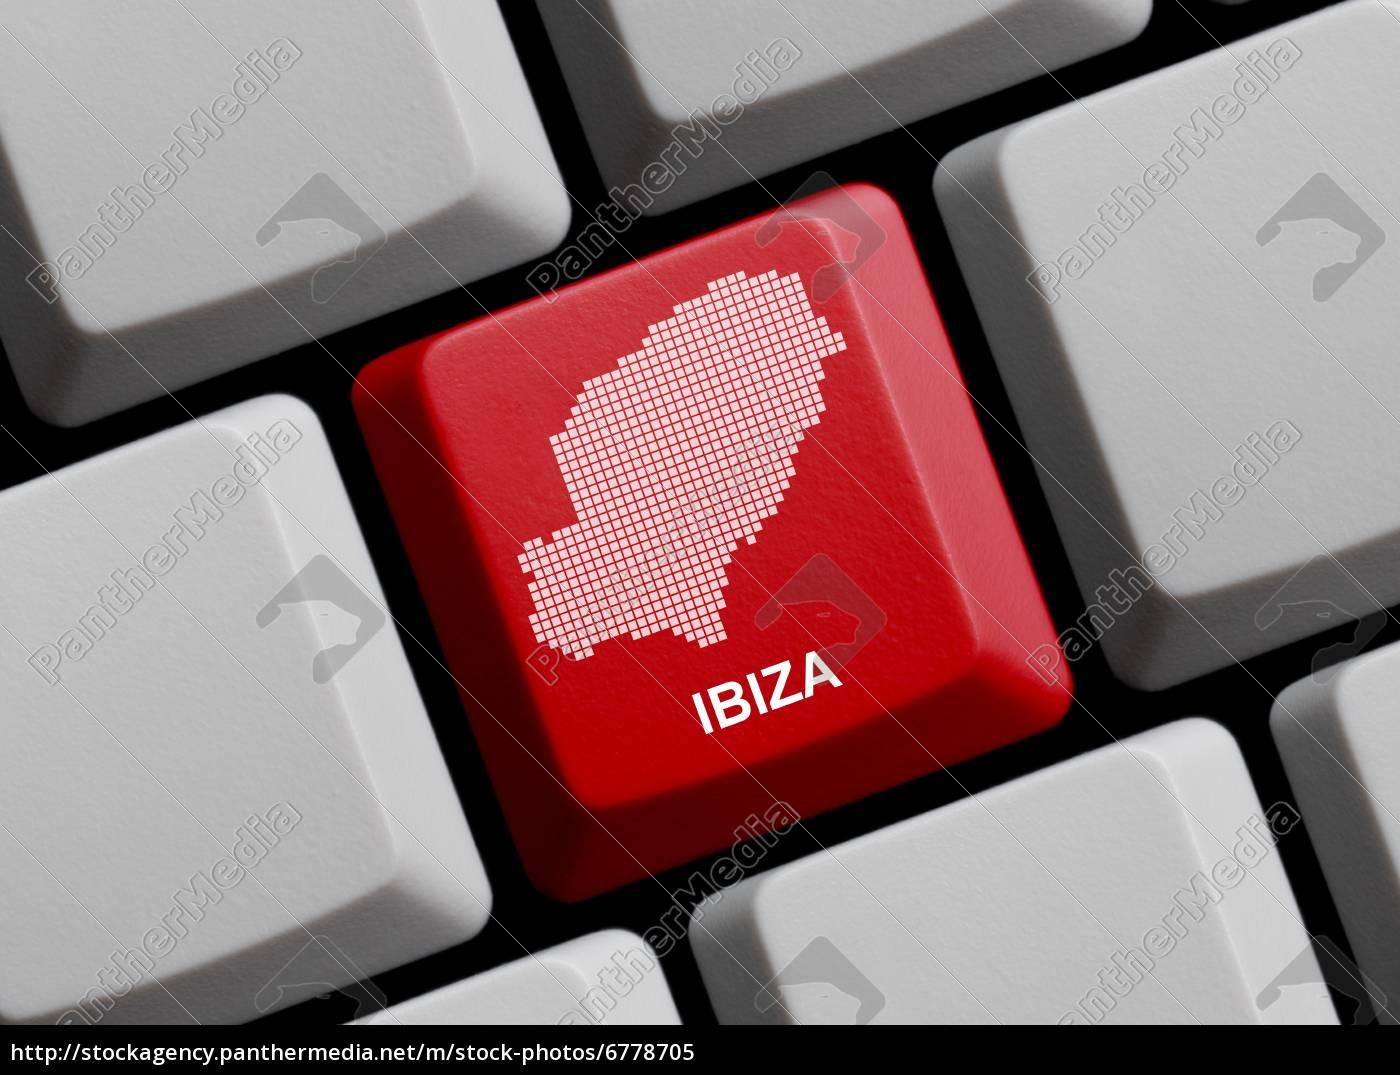 Ibiza Karte Umriss.Lizenzfreies Bild 6778705 Ibiza Umriss Auf Tastatur